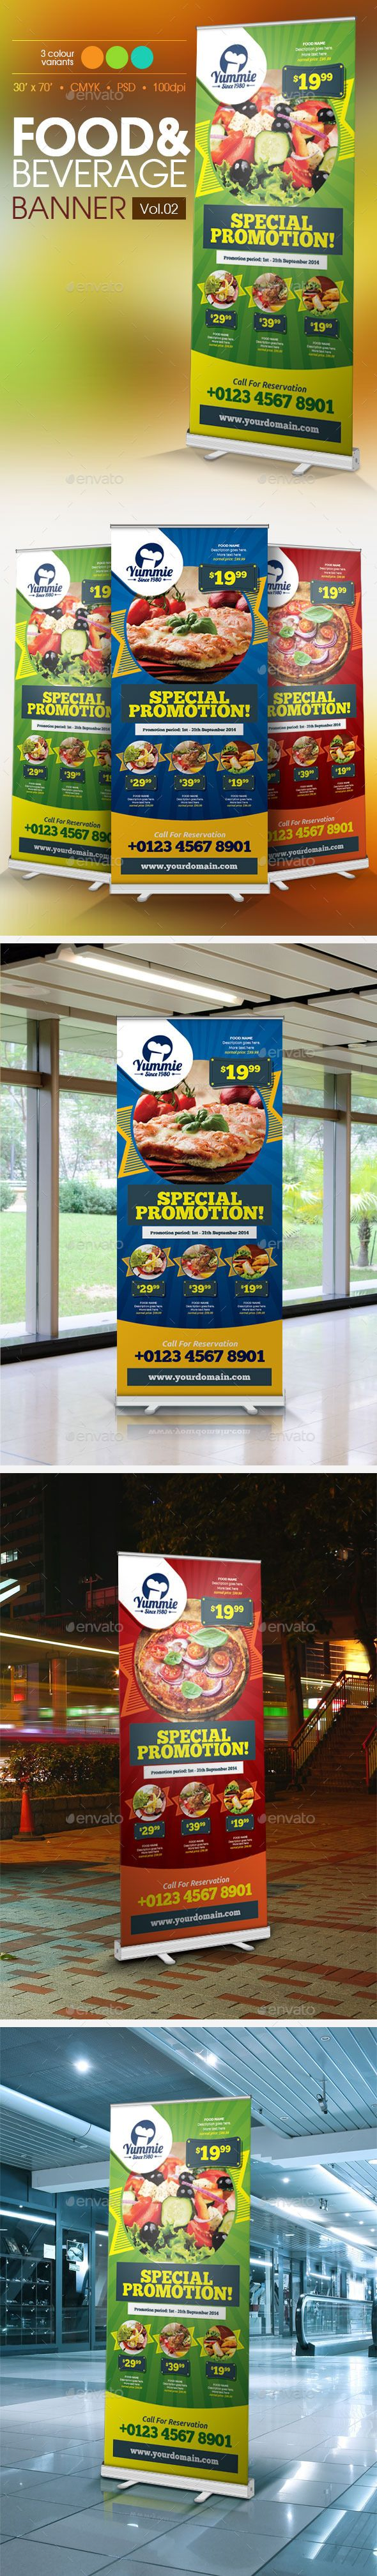 Restaurant Banner Template #design Download: http://graphicriver.net/item/restaurant-banner-vol2/11422980?ref=ksioks